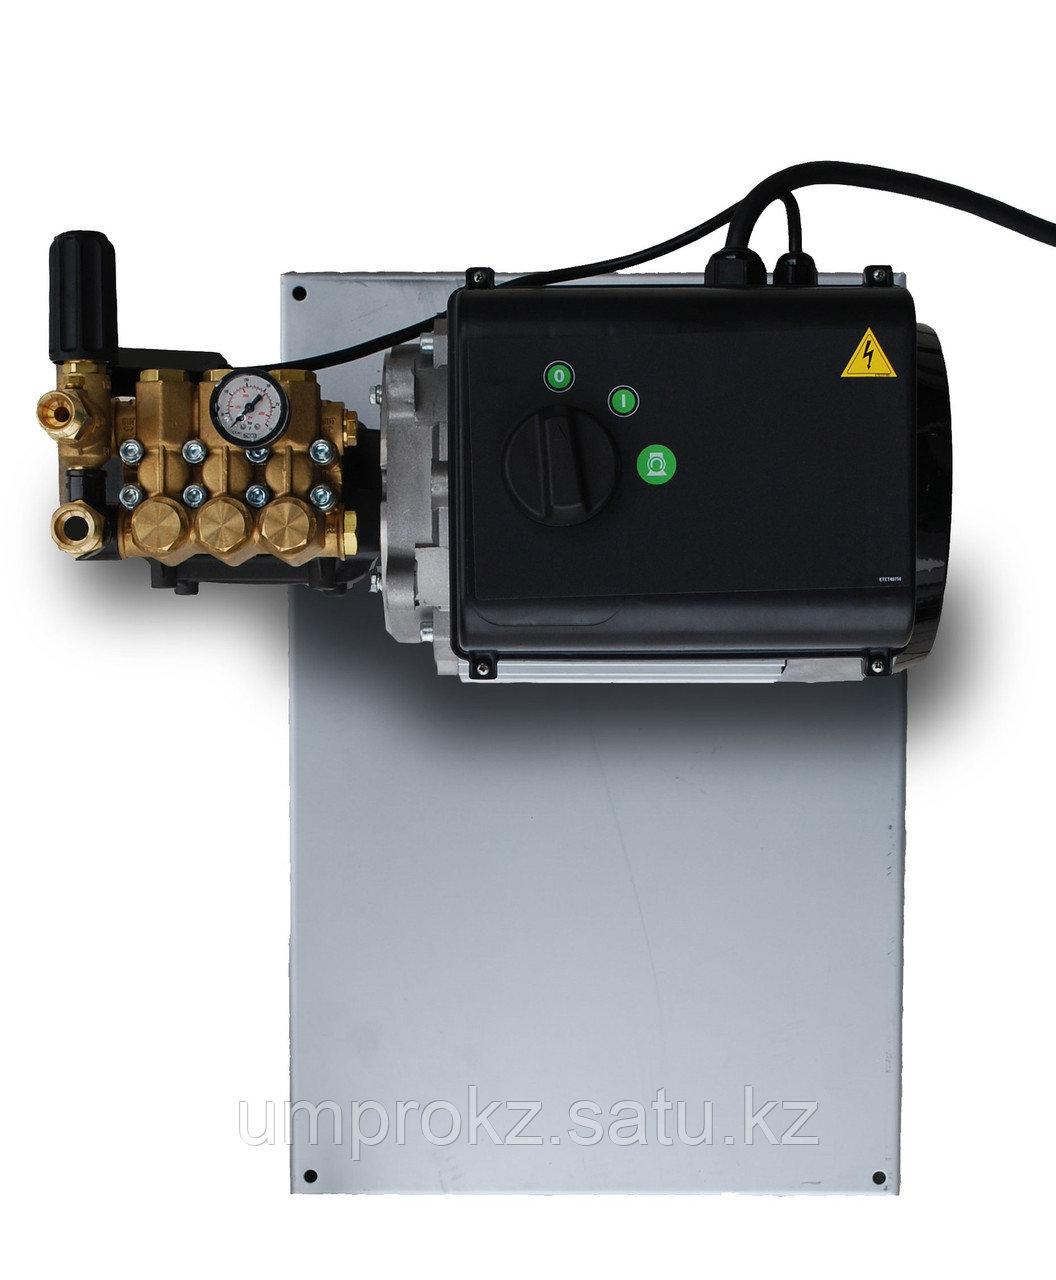 MLC-C D 1915 P c E2B2014 (Стационарный настенный) PPEL 40087